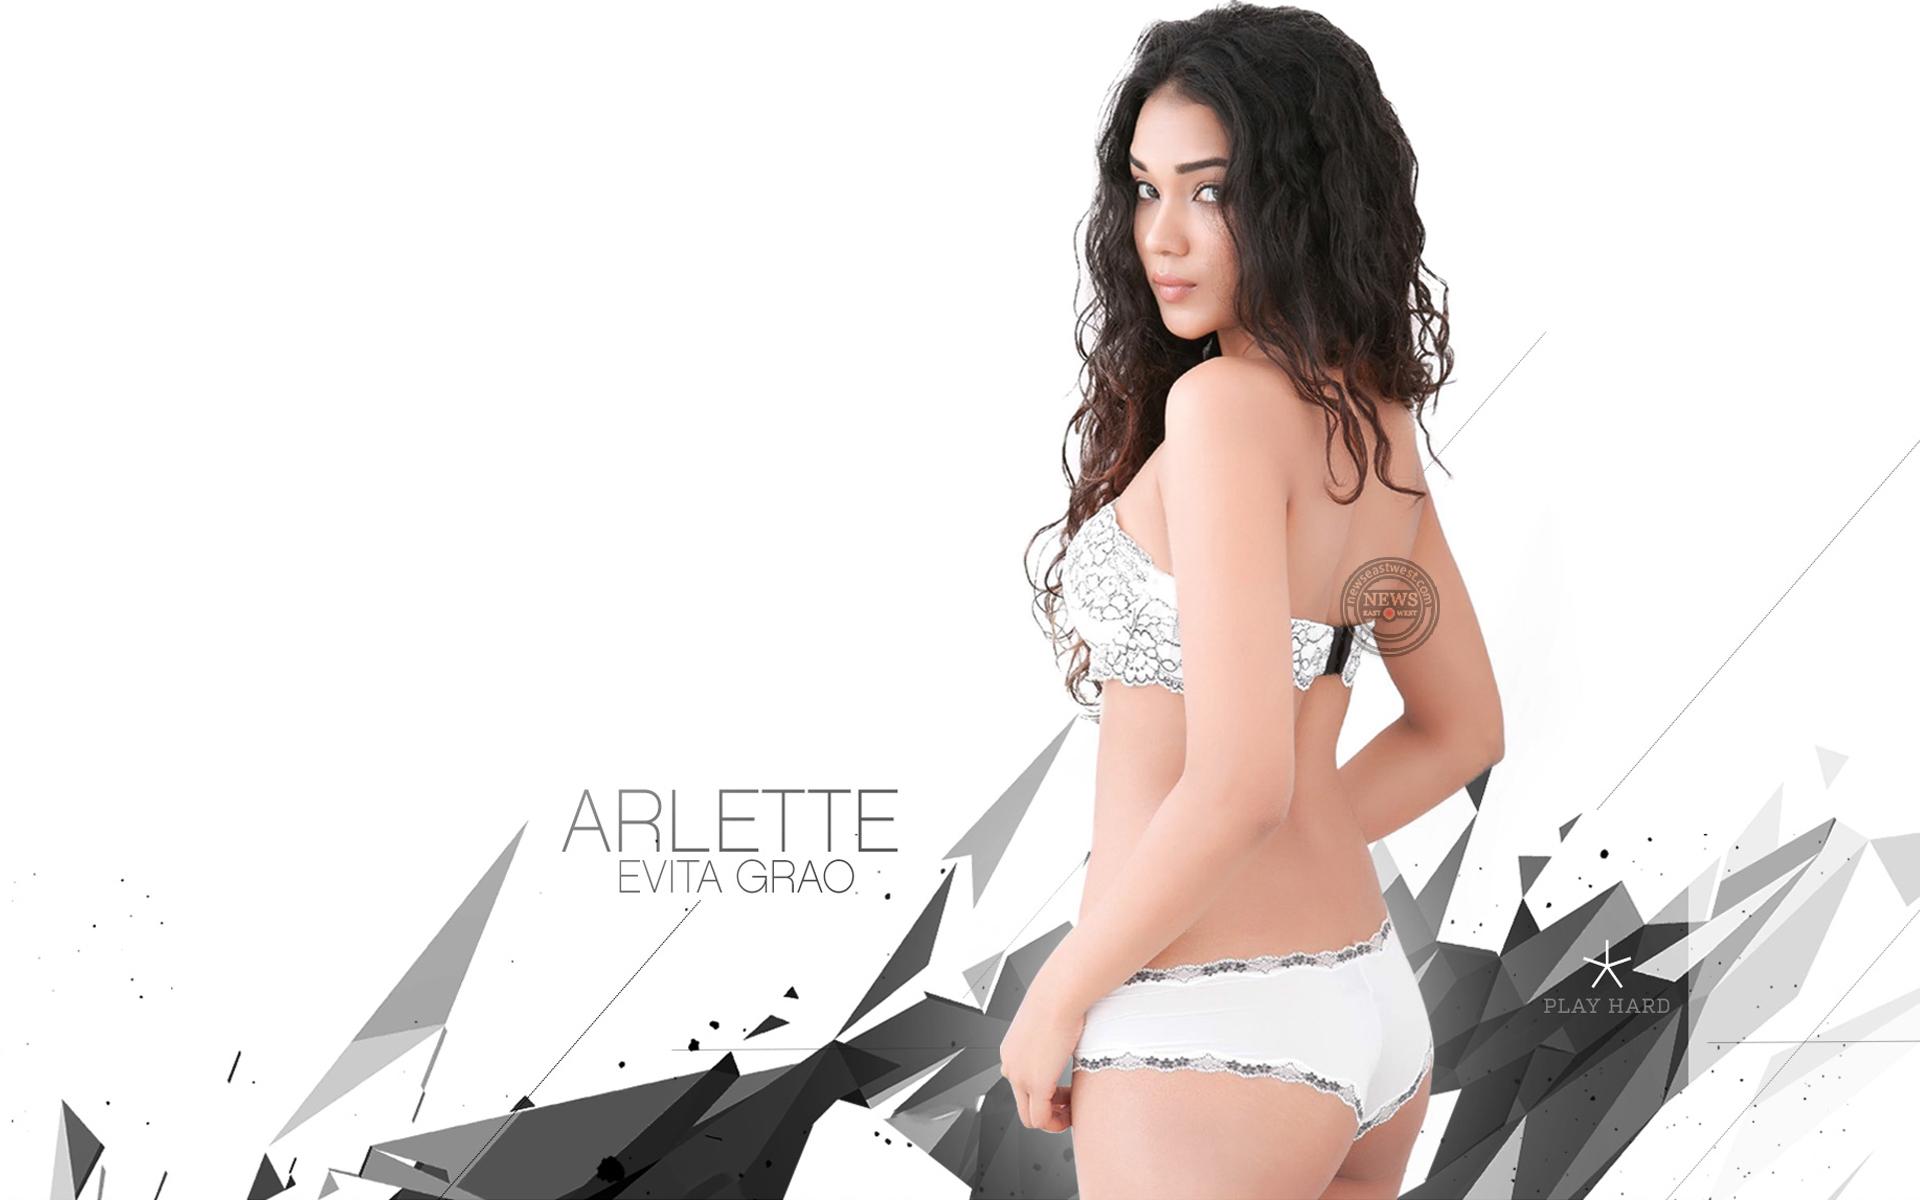 arlette-evita-grao-hot-wallpaper